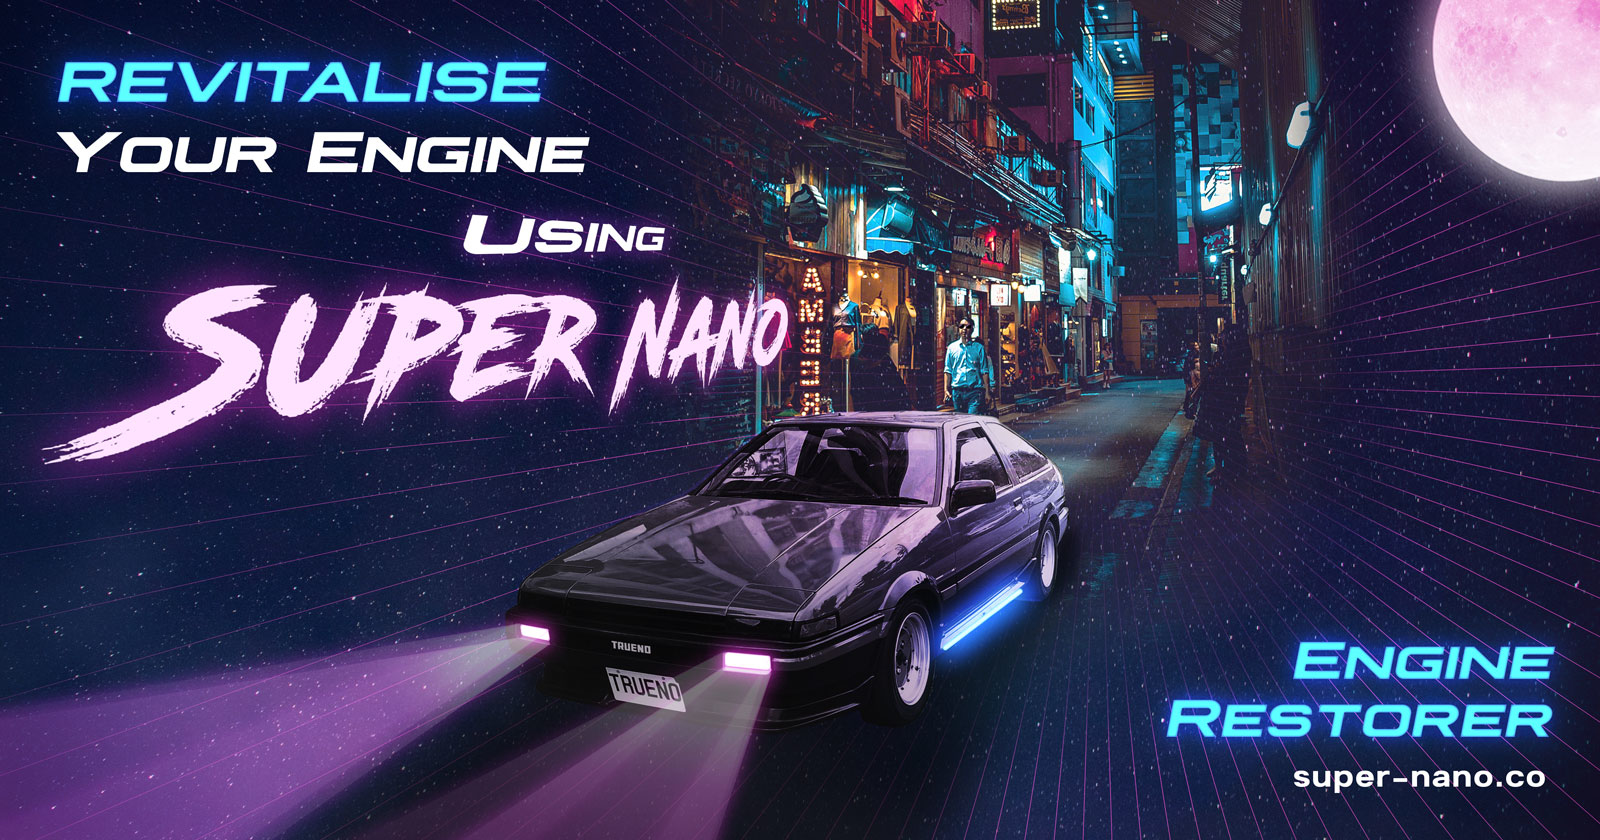 revitalise your engine using super nano engine restorer home banner ae86 trueno hong kong